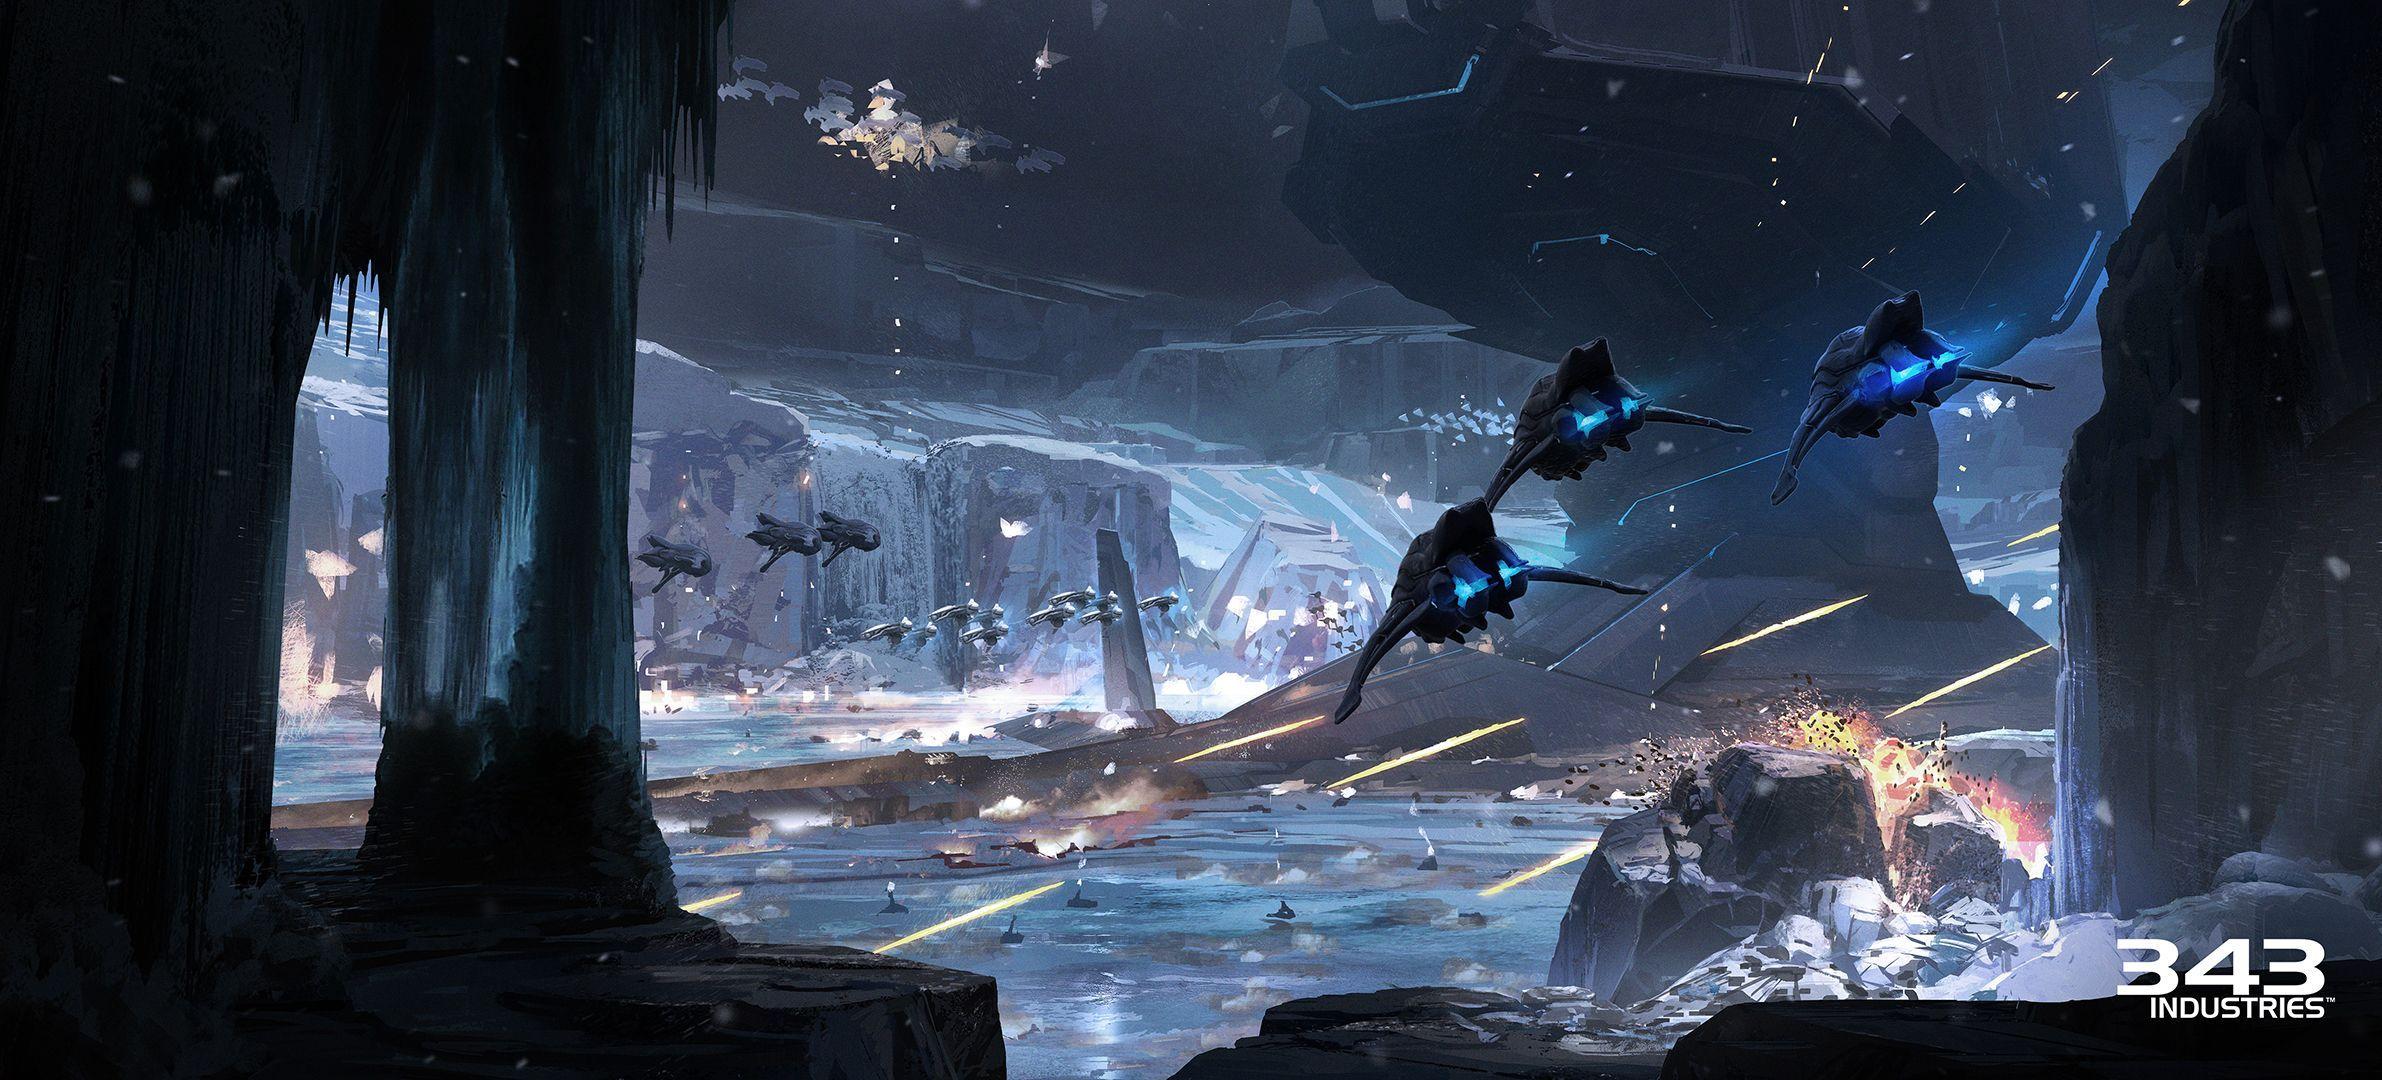 Video Game Halo 5 Guardians Wallpaper Avec Images Fond Ecran Arriere Plan Fond D Ecran Wallpaper